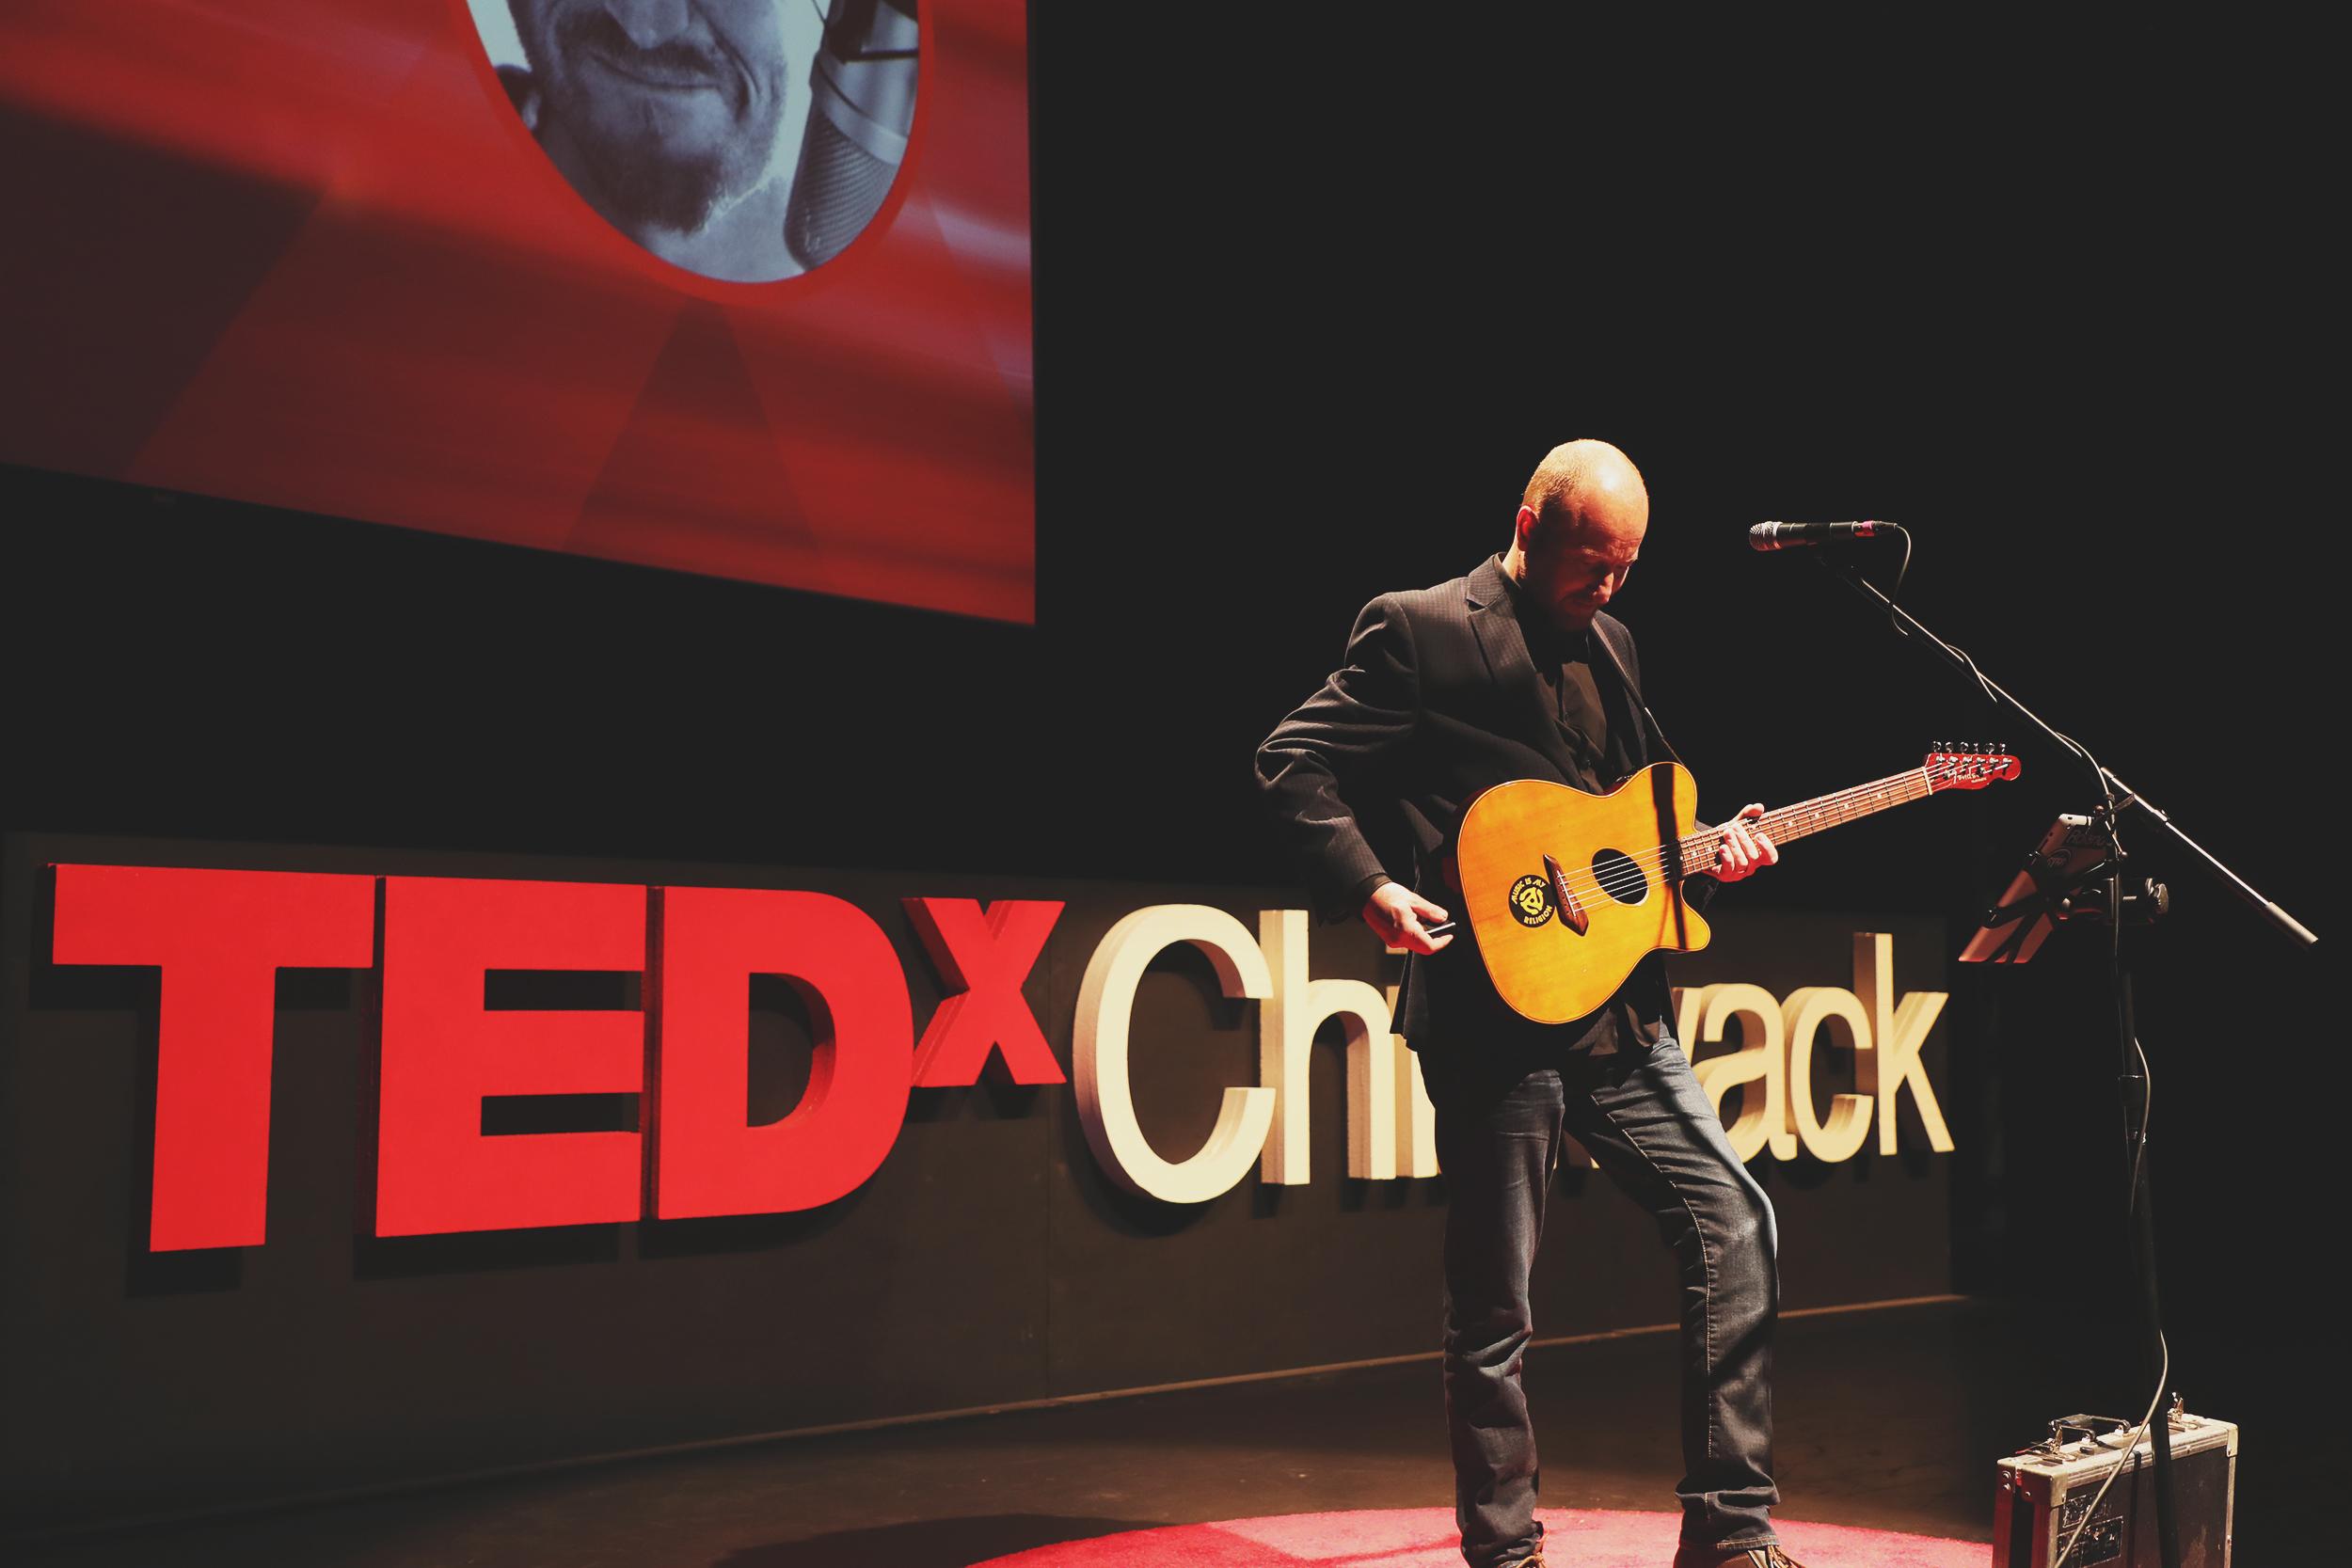 TEDX_23.jpg